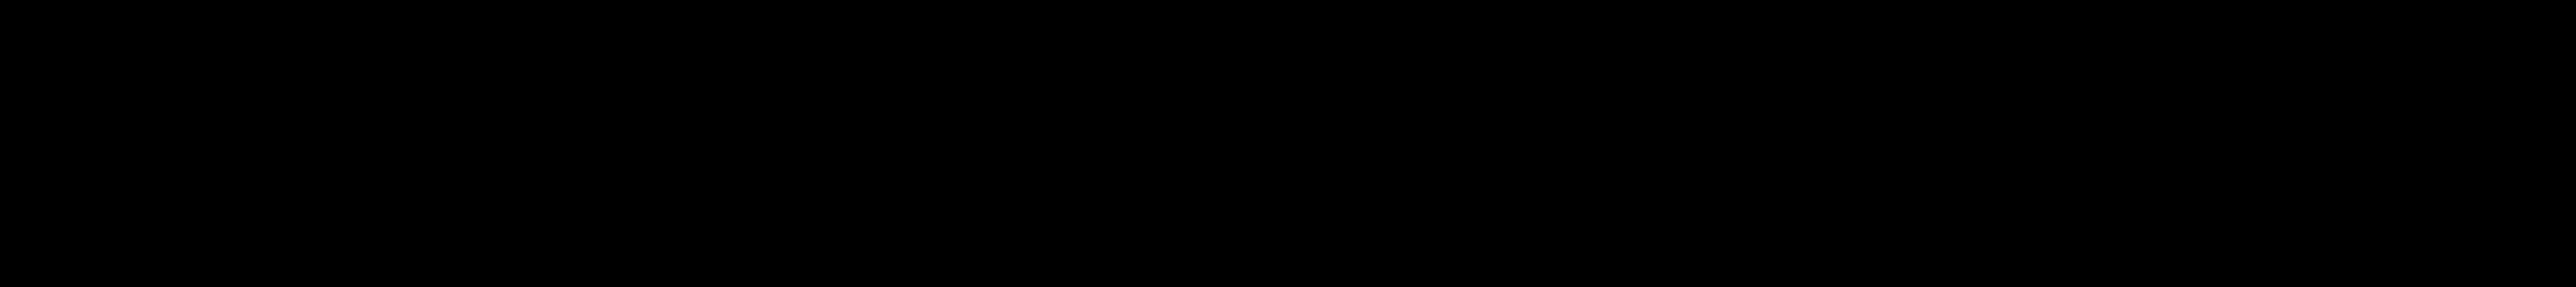 SAMESTORY-logo-modern-black